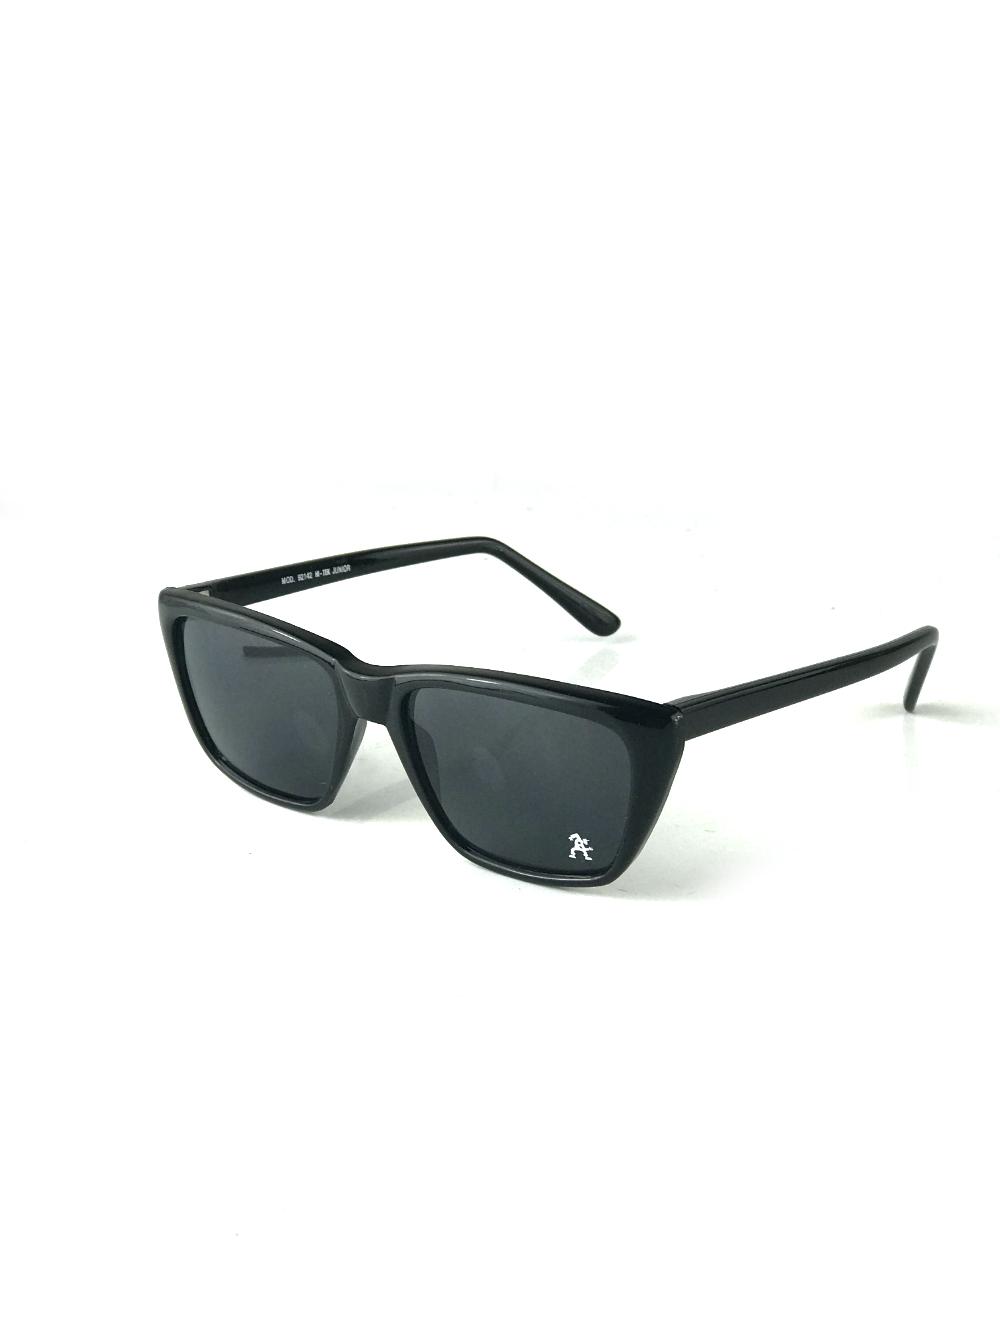 black square vintage retro sunglasses Wayfarer style mod92142 Hi Tek Junior